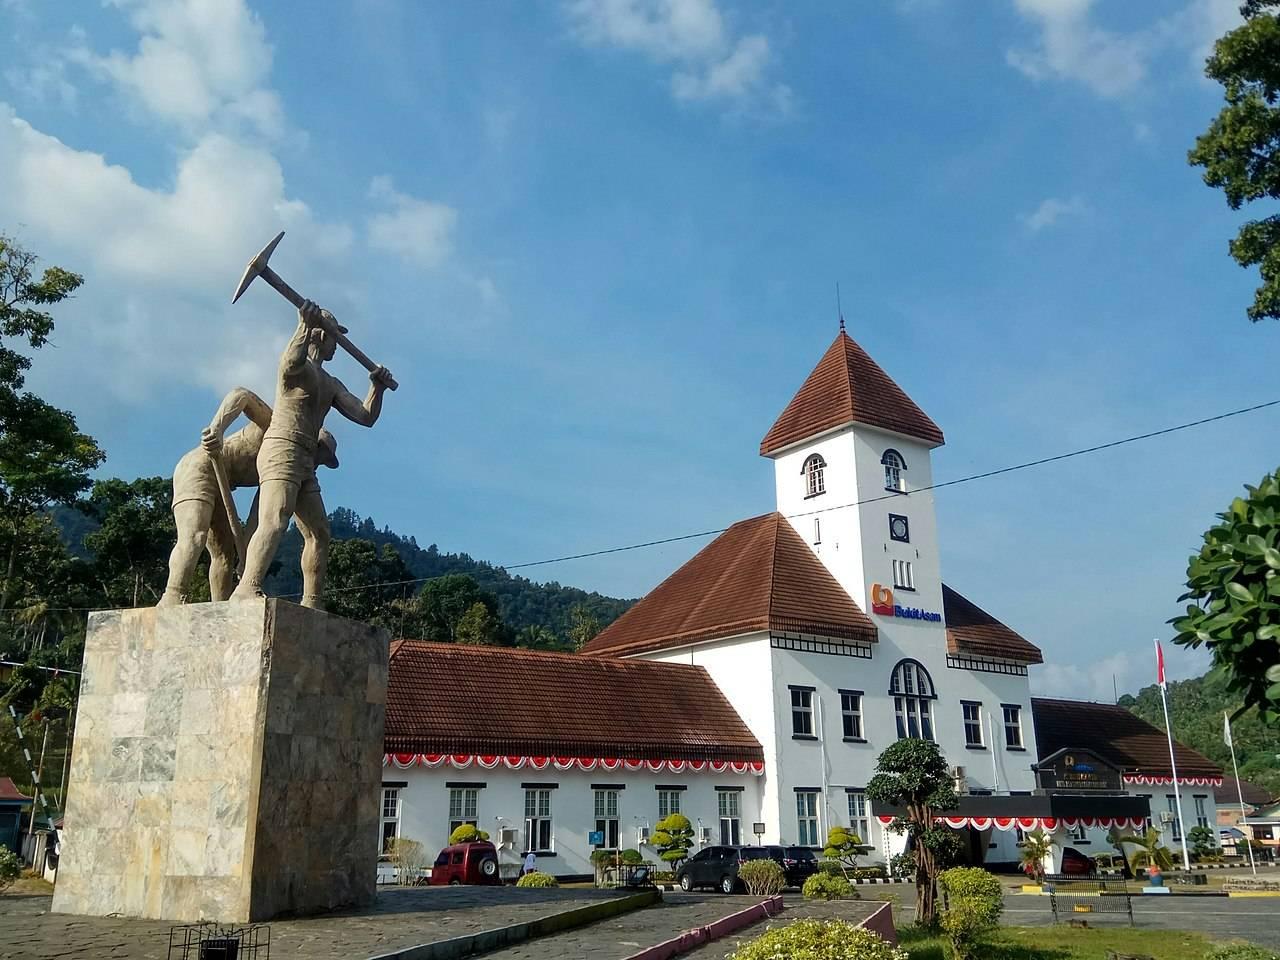 Kota Sawahlunto City Sumber Indonesia